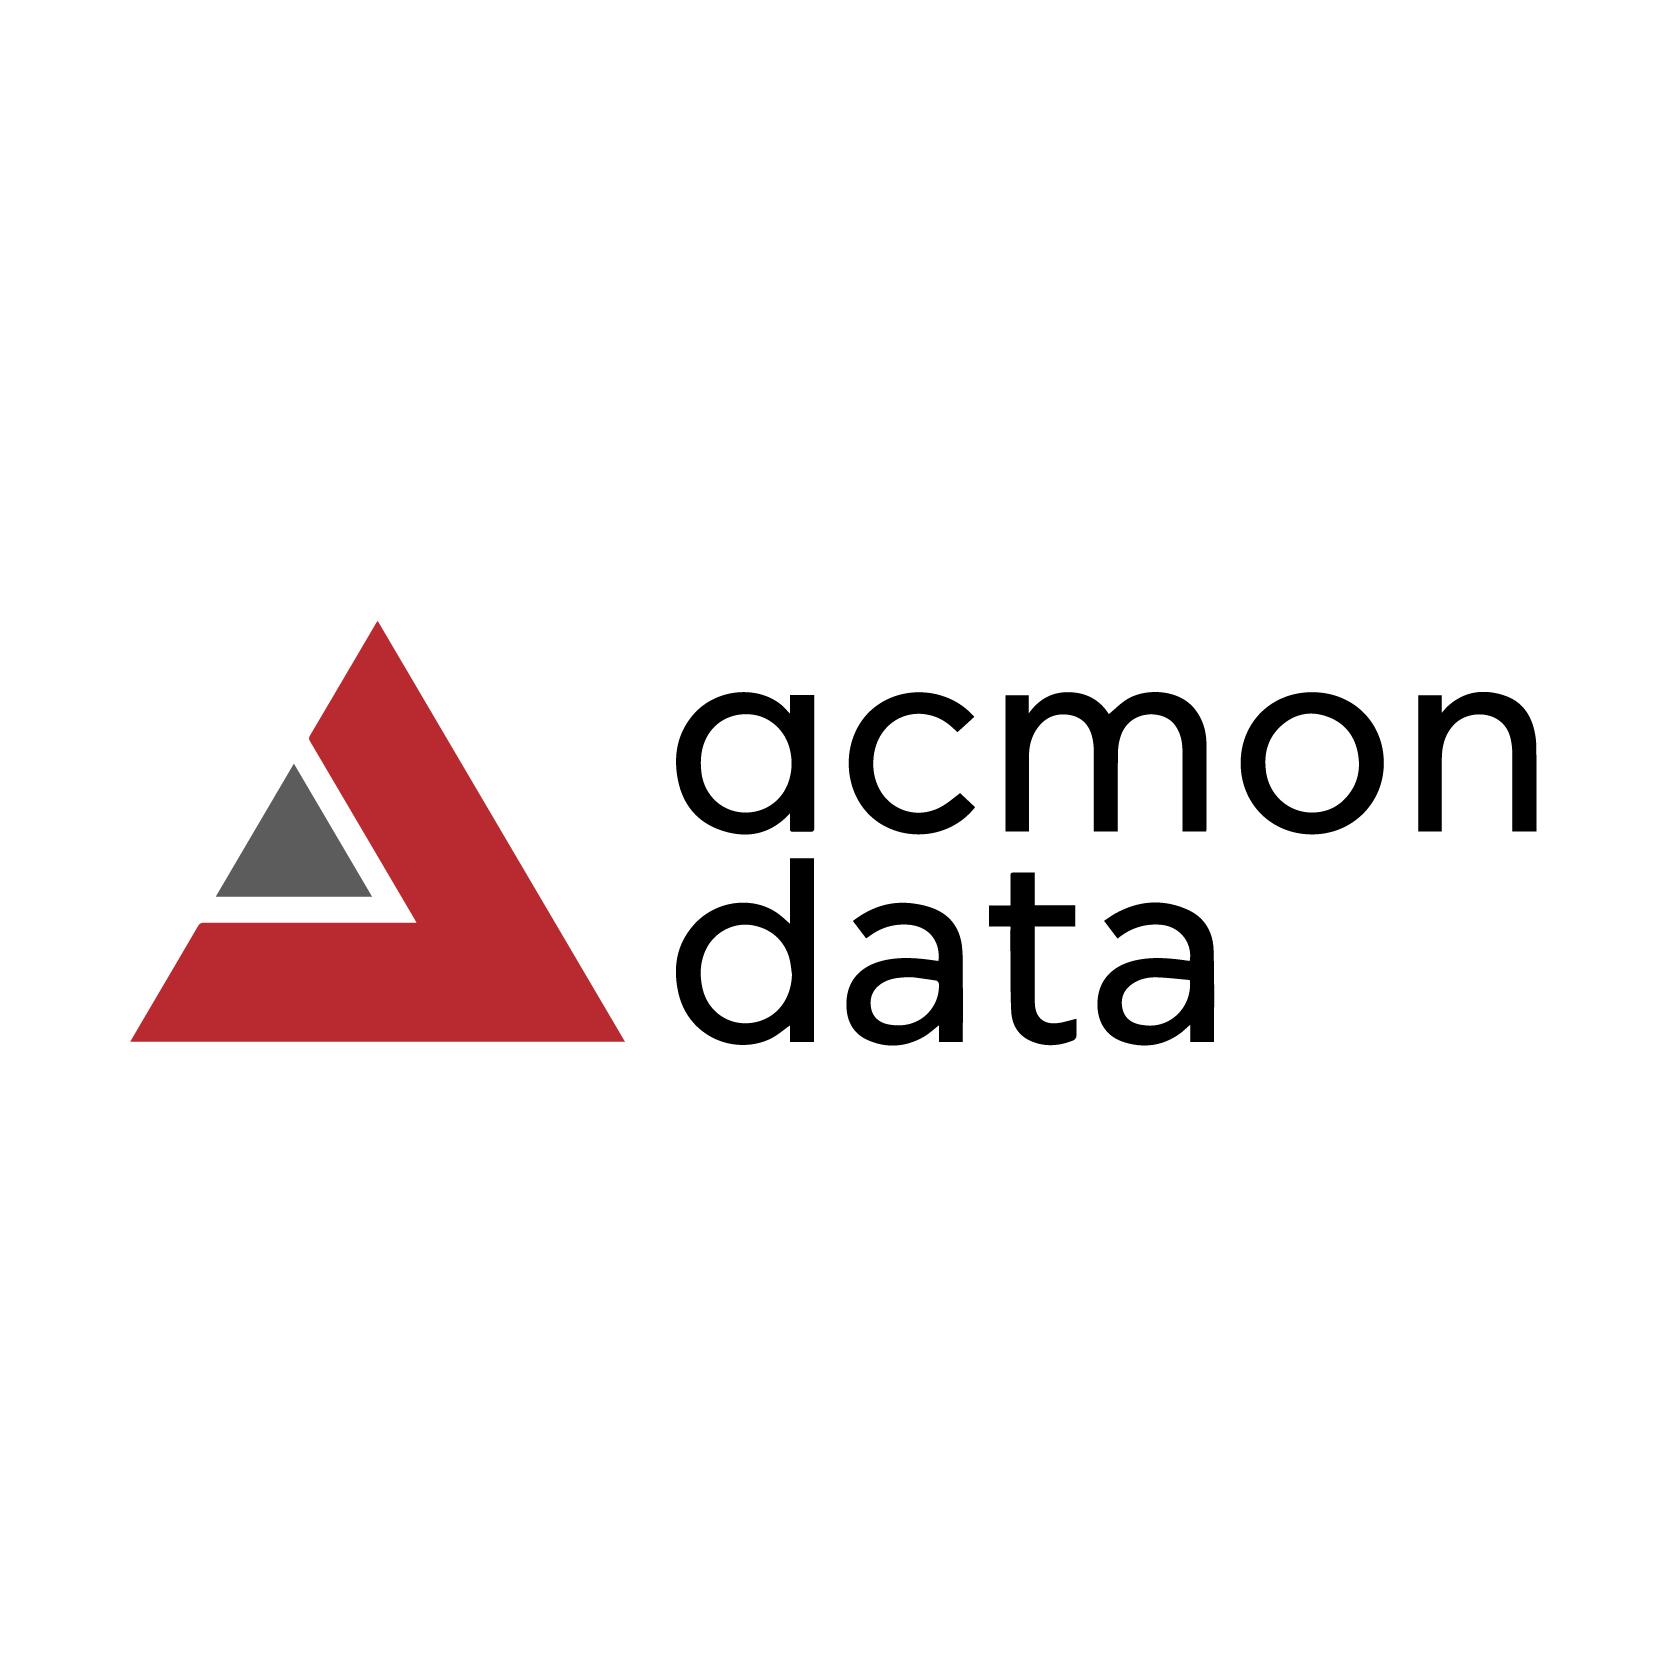 ACMON DATA